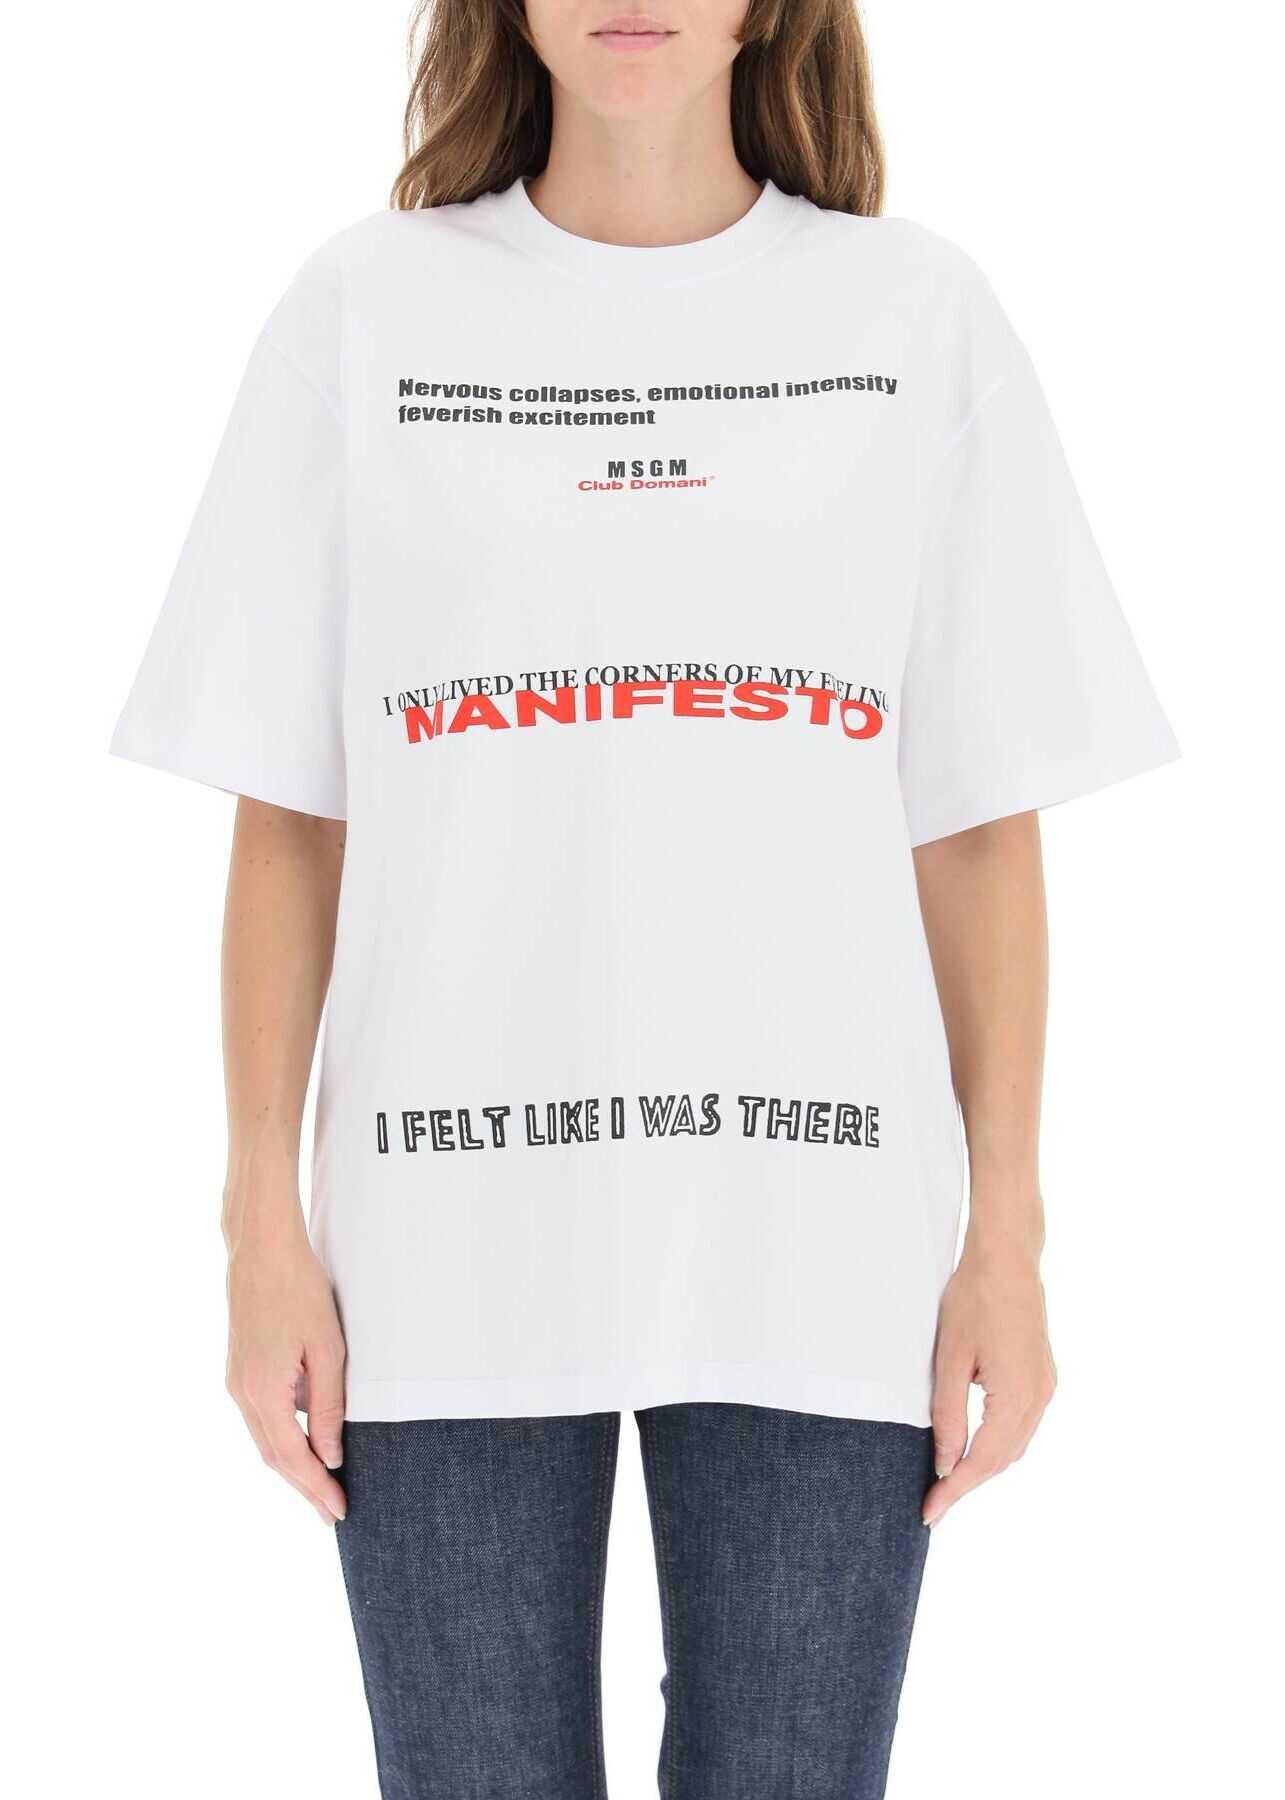 MSGM T-Shirt With Manifesto Graphics 3142MDM190 217798 OPTICAL WHITE image0